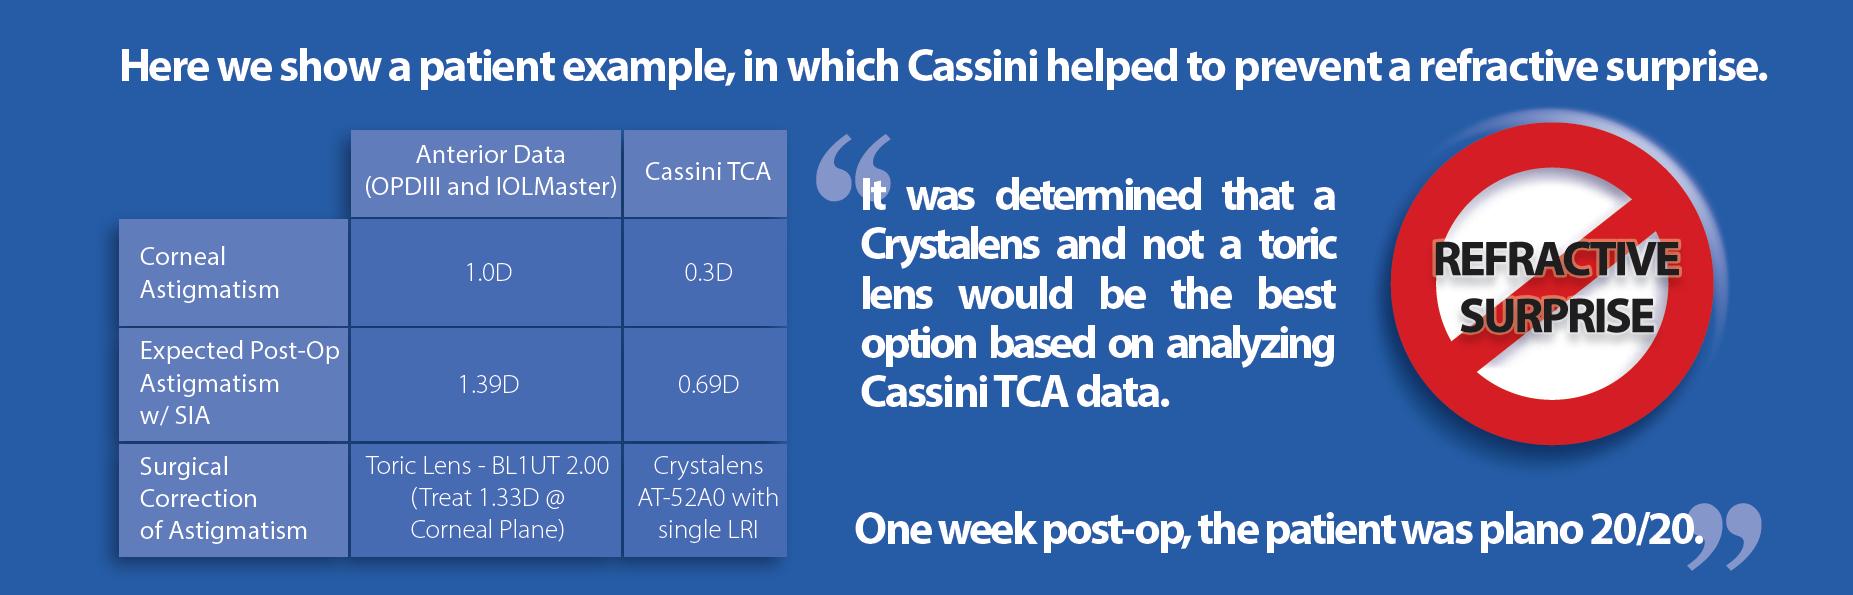 Screenshot - Case example - Dr. Matossian 2015